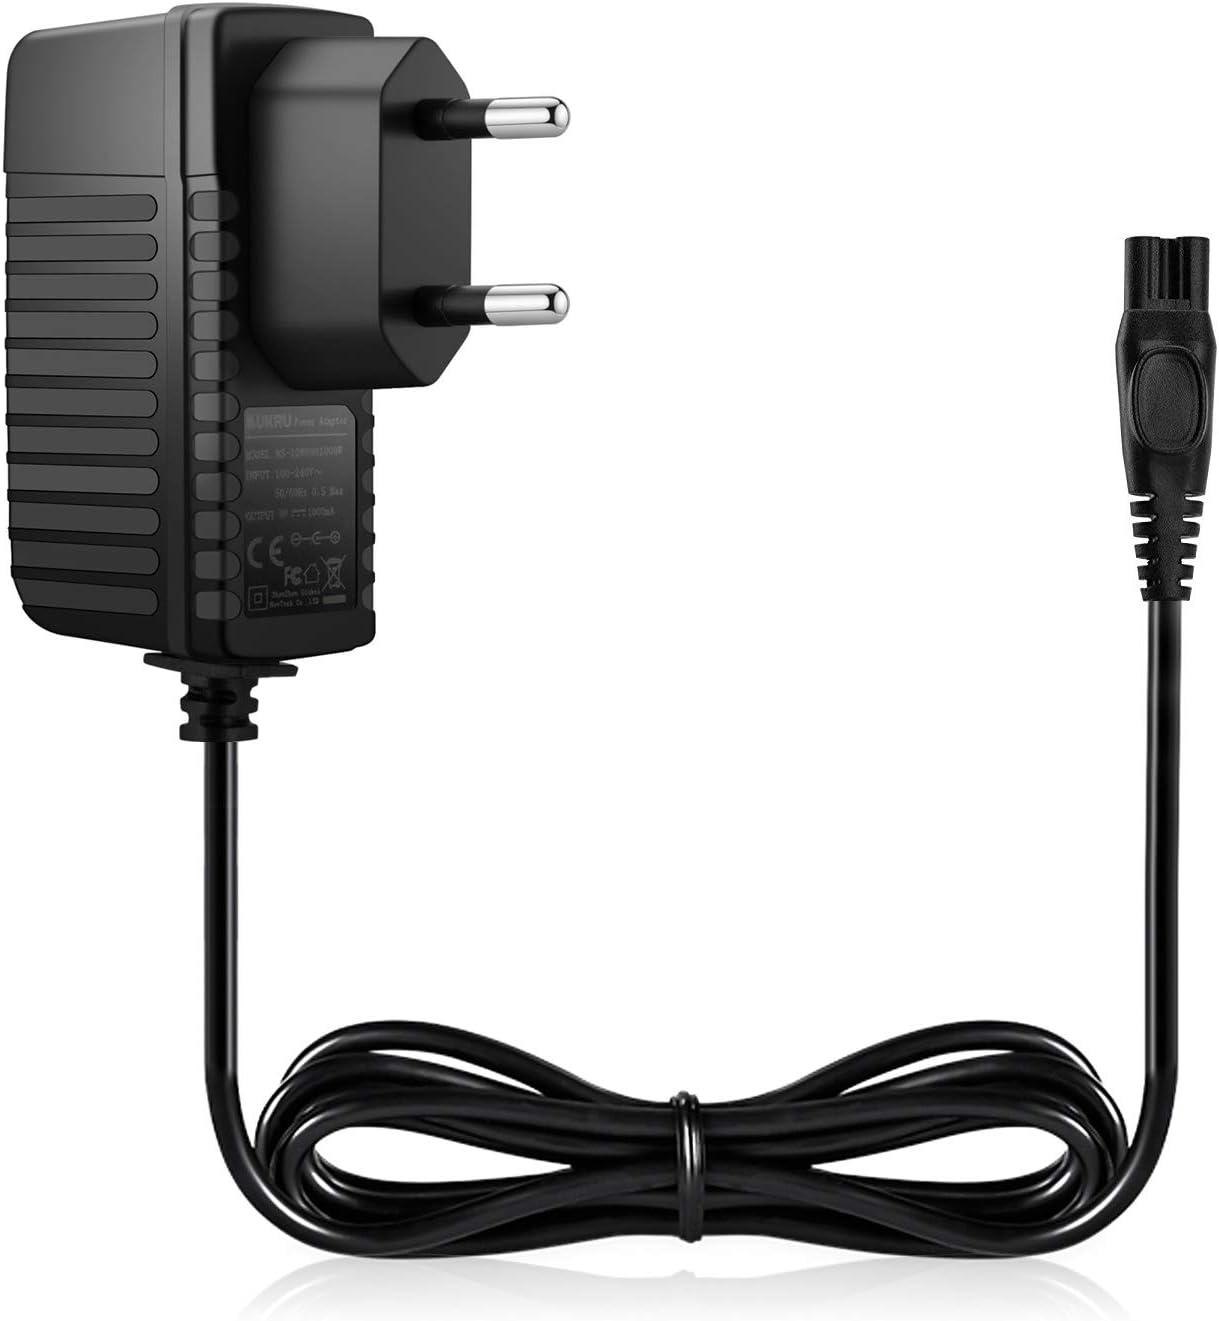 Aukru Cargador de Fuente de alimentación 15V para Philips afeitadora eléctrica 9195XL, 9190XL, 9170XL, HQ8100, HQ8250 ect.: Amazon.es: Electrónica